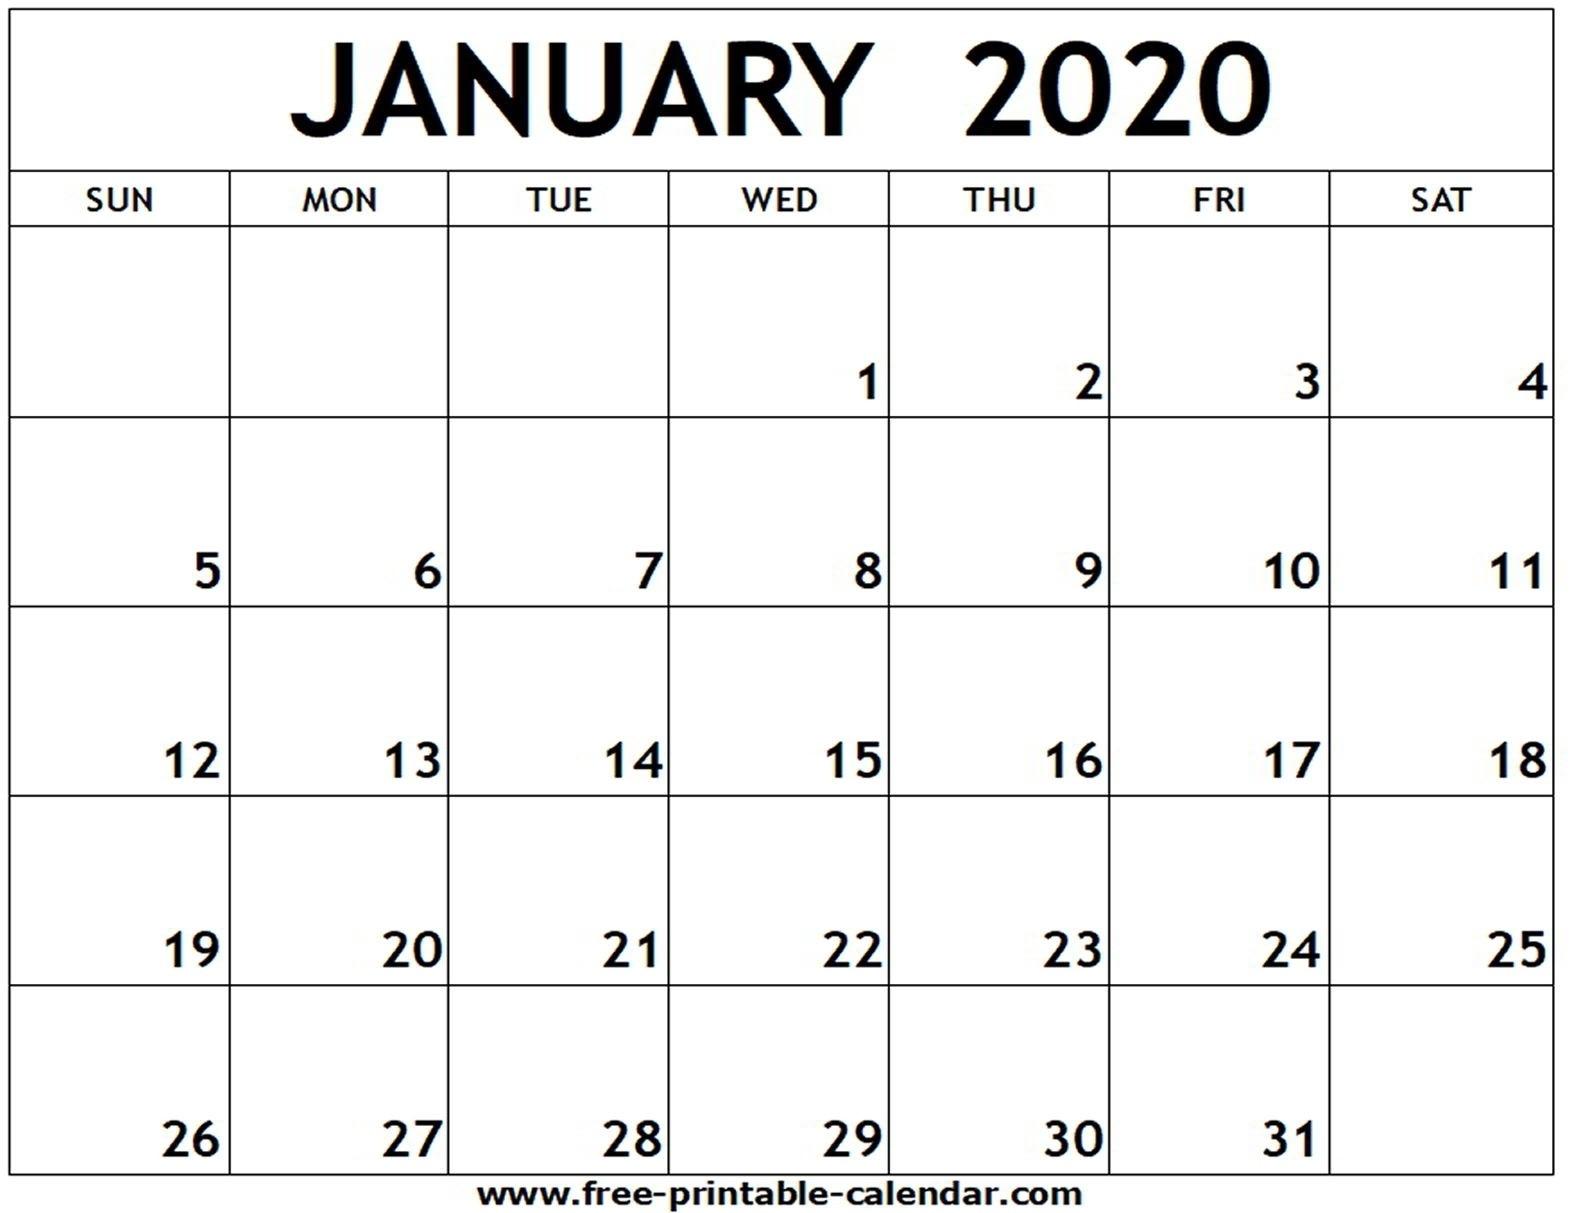 Free Printable 4X6 Calendar 2020 | Monthly Printable Calender  Free 4X6 Printable Calendar 2020